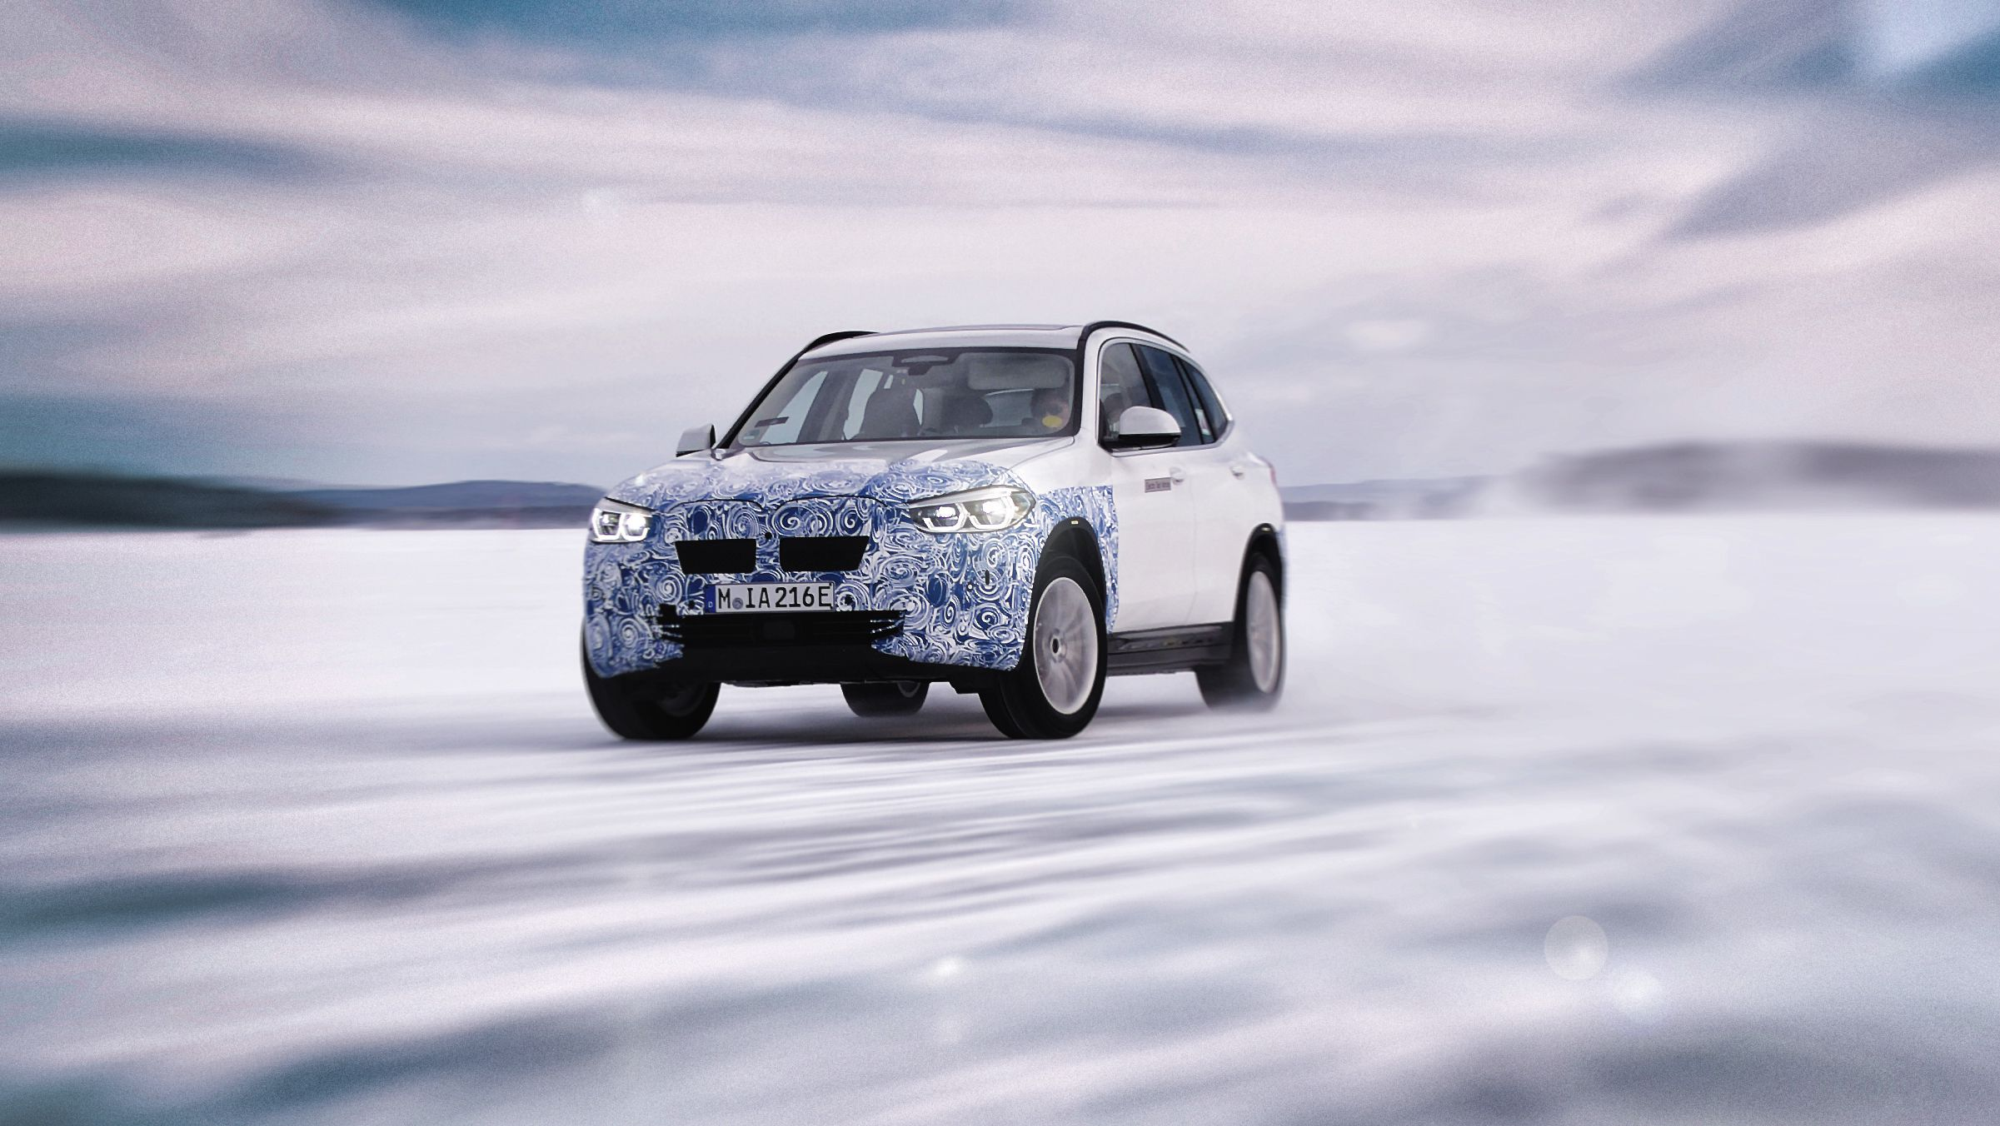 BMW viser frem den nye elbilen i4 på vintertesting i ...